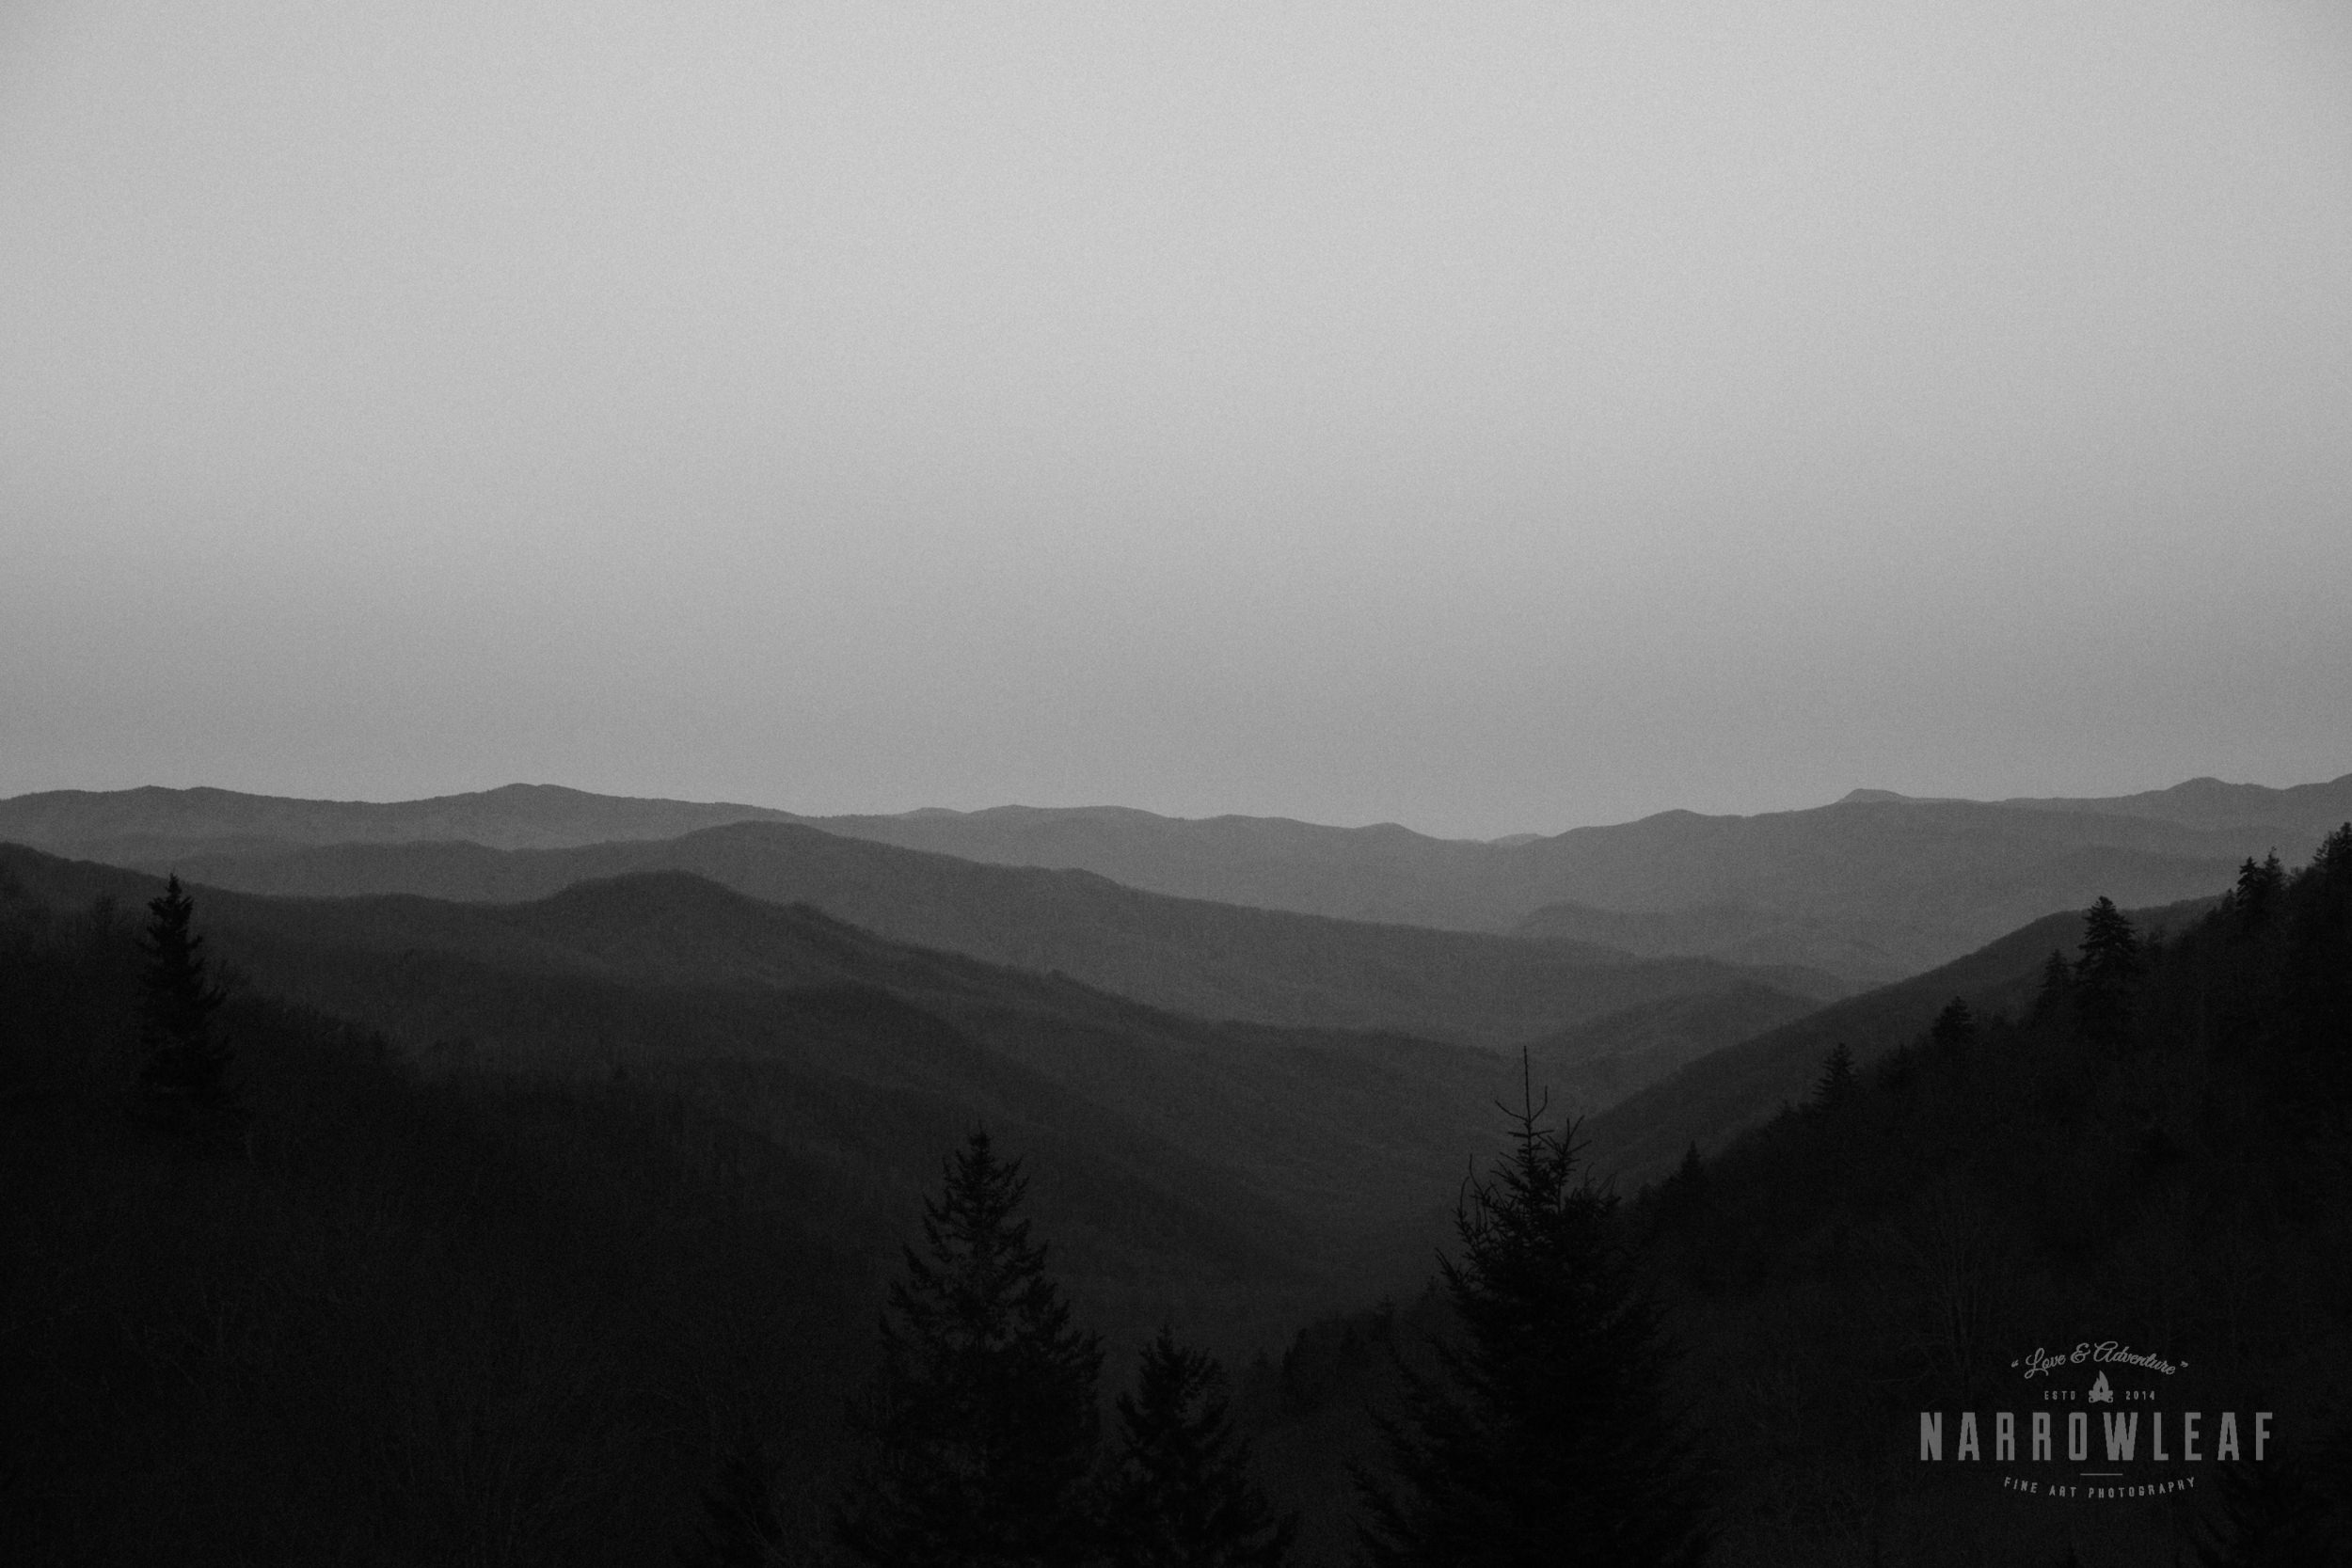 mount-mitchell-North-Carolina-elopement-photographer-Narrowleaf_Love_and_Adventure_Photography-0123.jpg